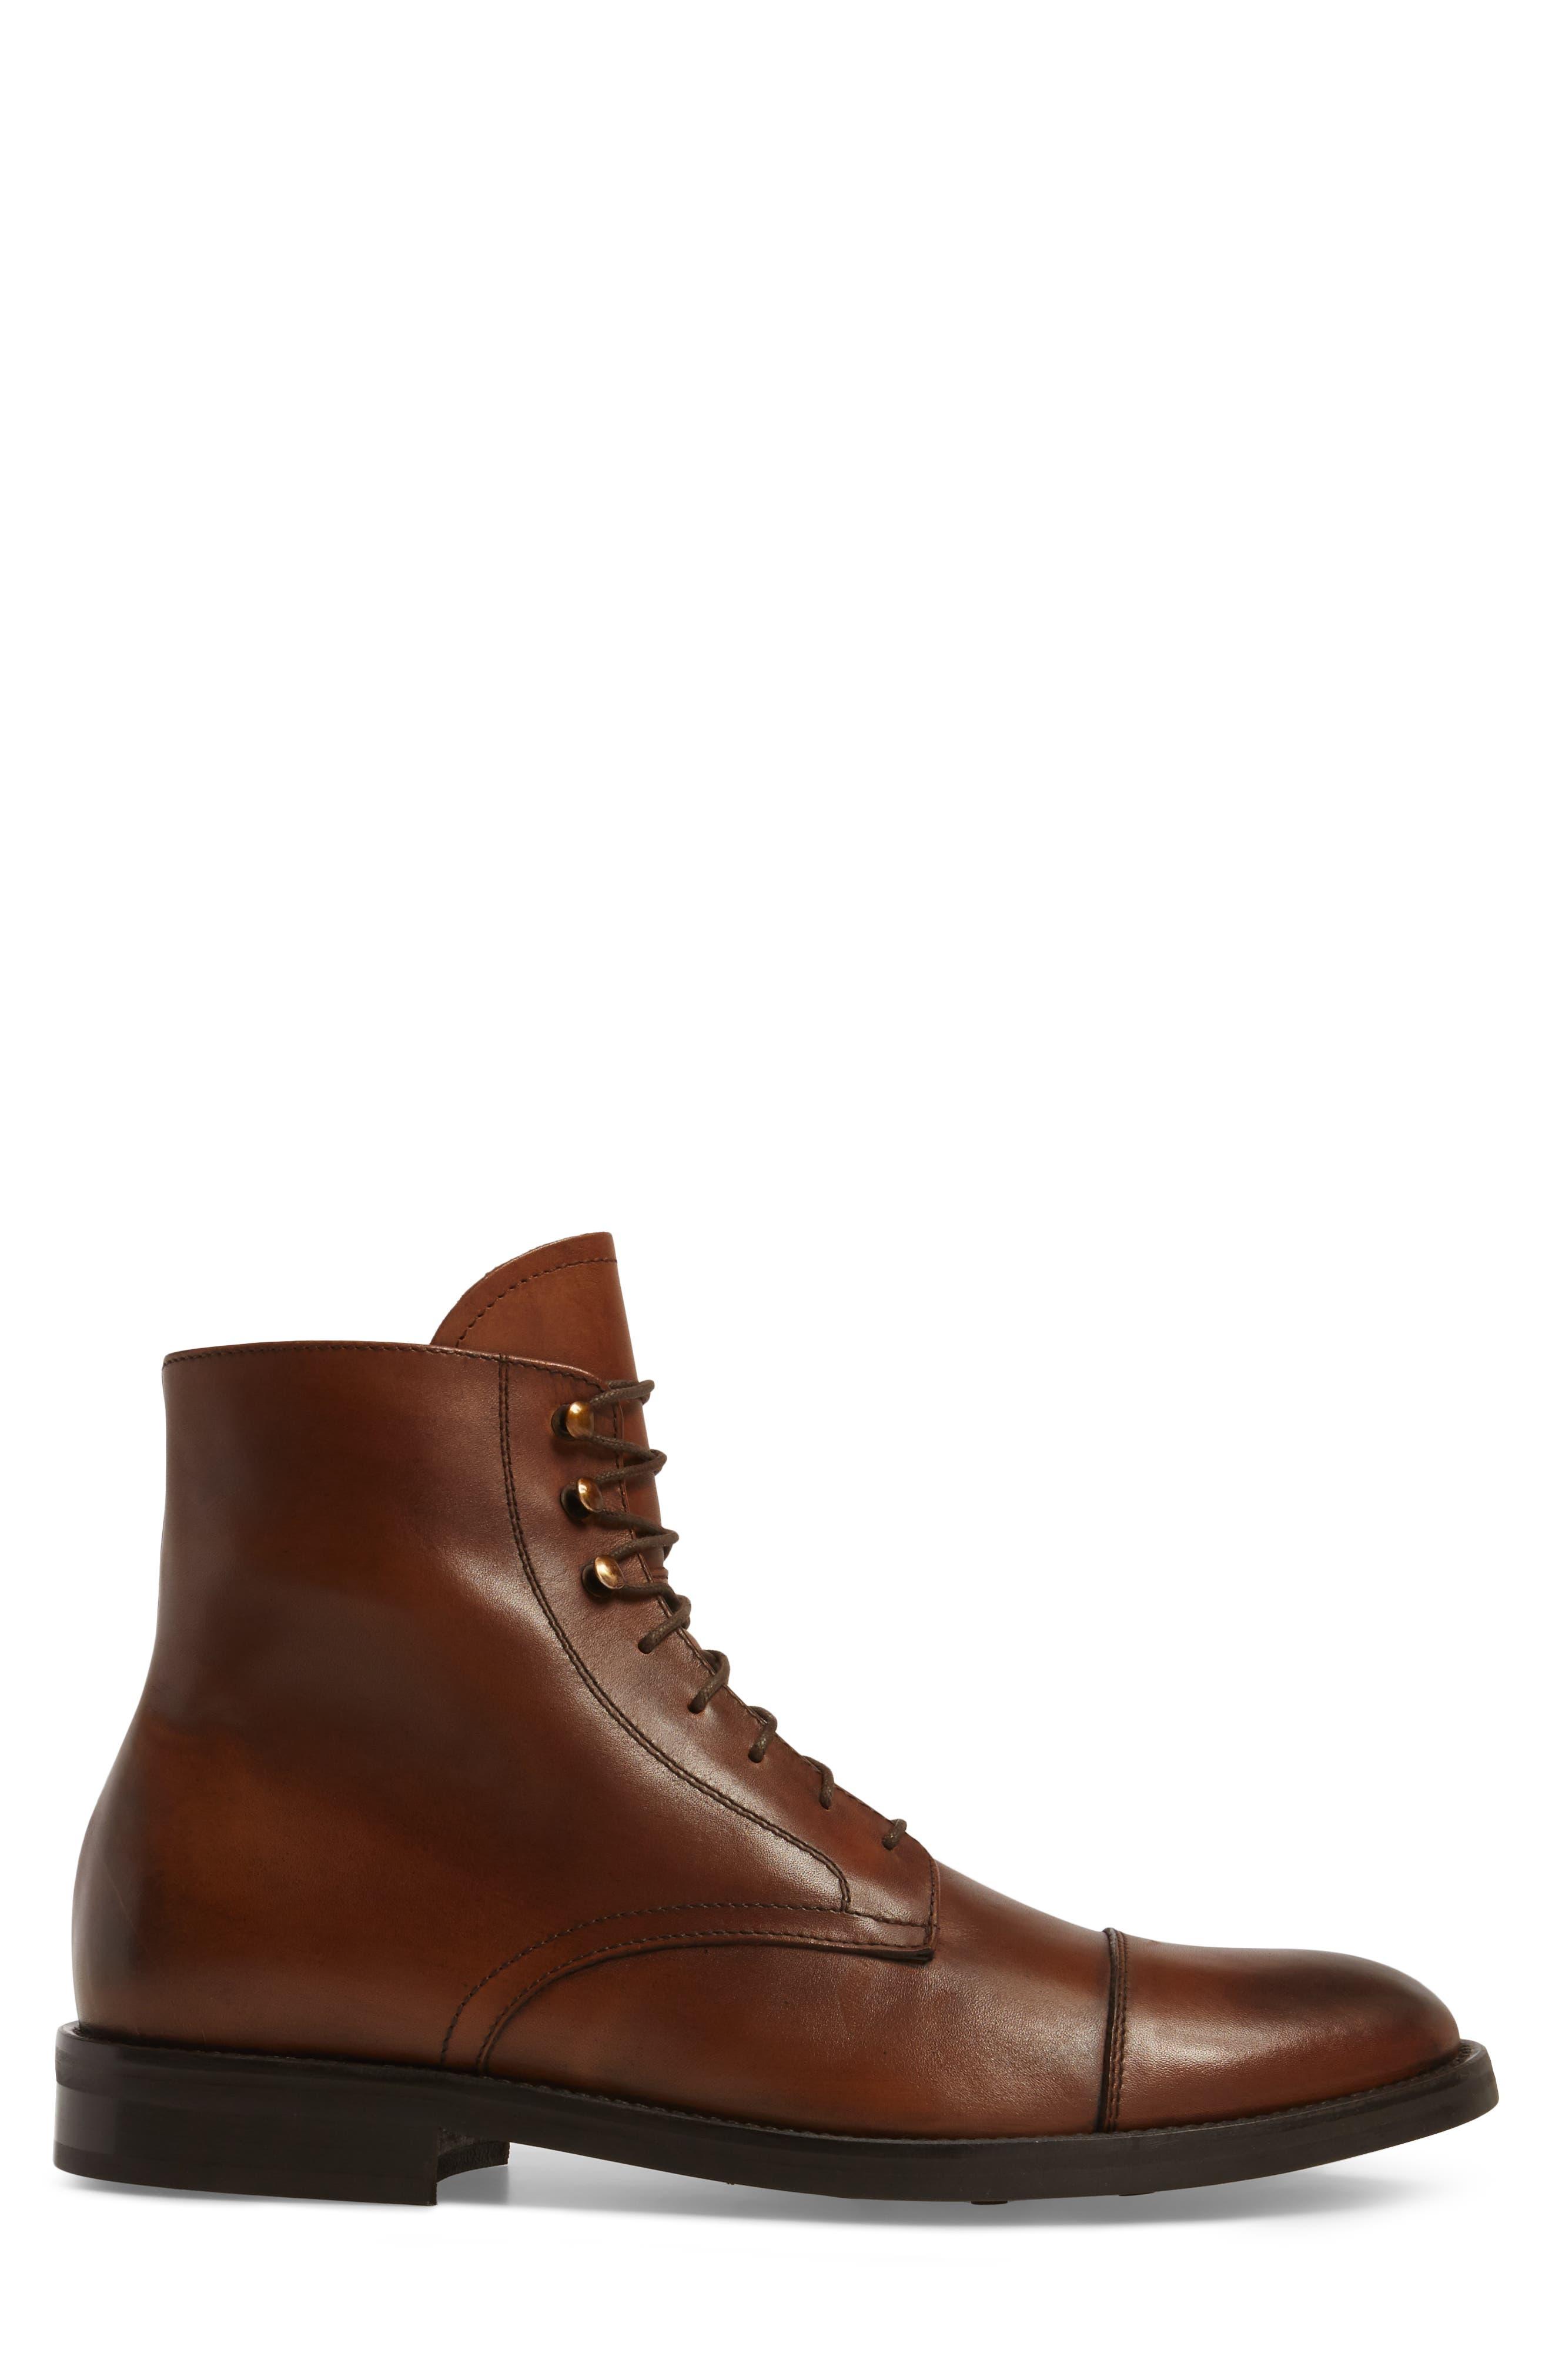 Alternate Image 3  - To Boot New York Henri Cap Toe Boot (Men)